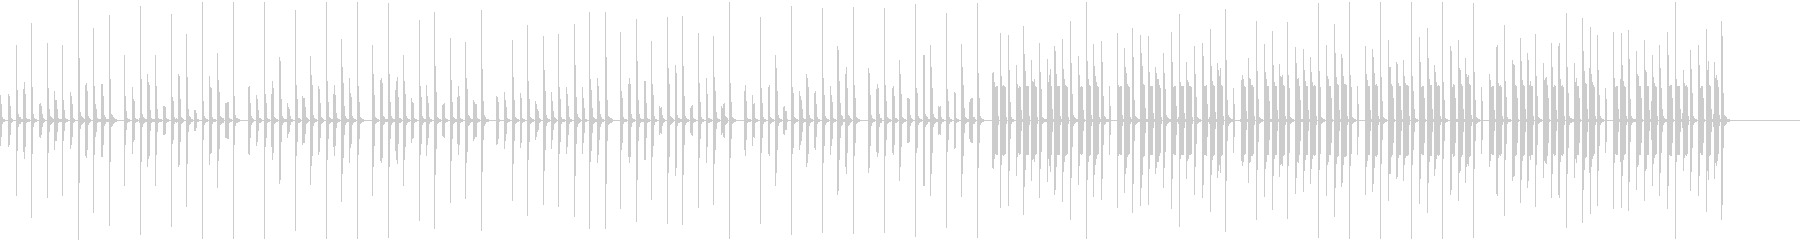 creo_leo_bgm26の未再生の波形